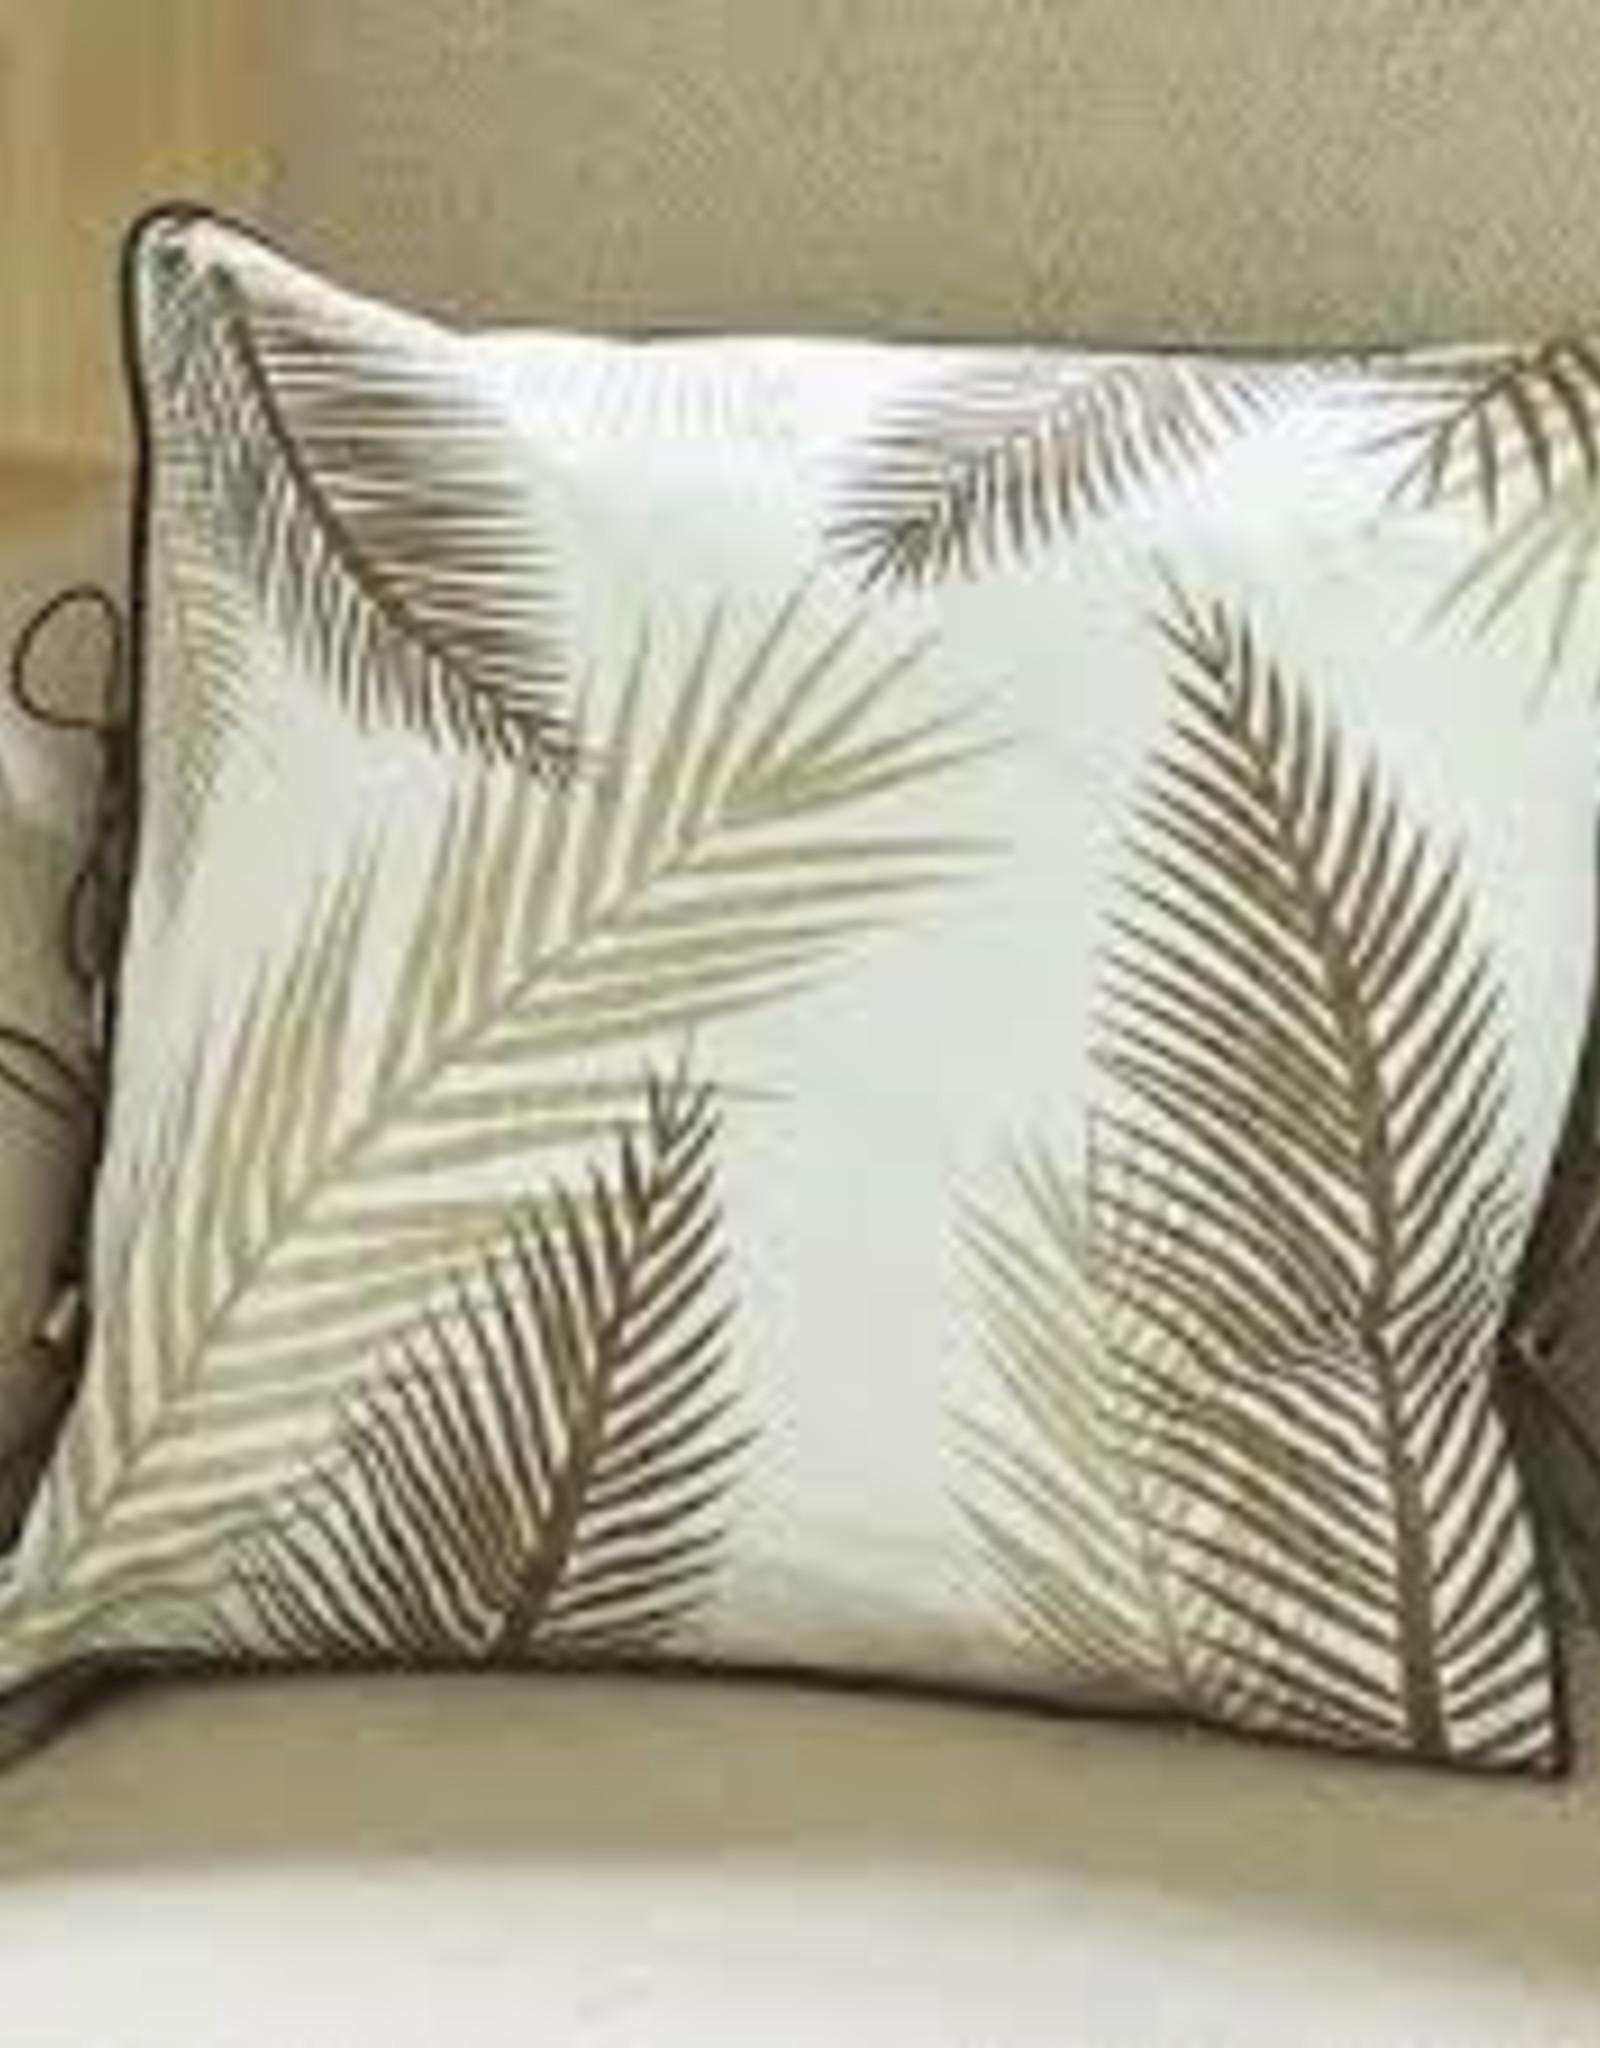 Riviera Maison Pure jungle pillow cover 40x40